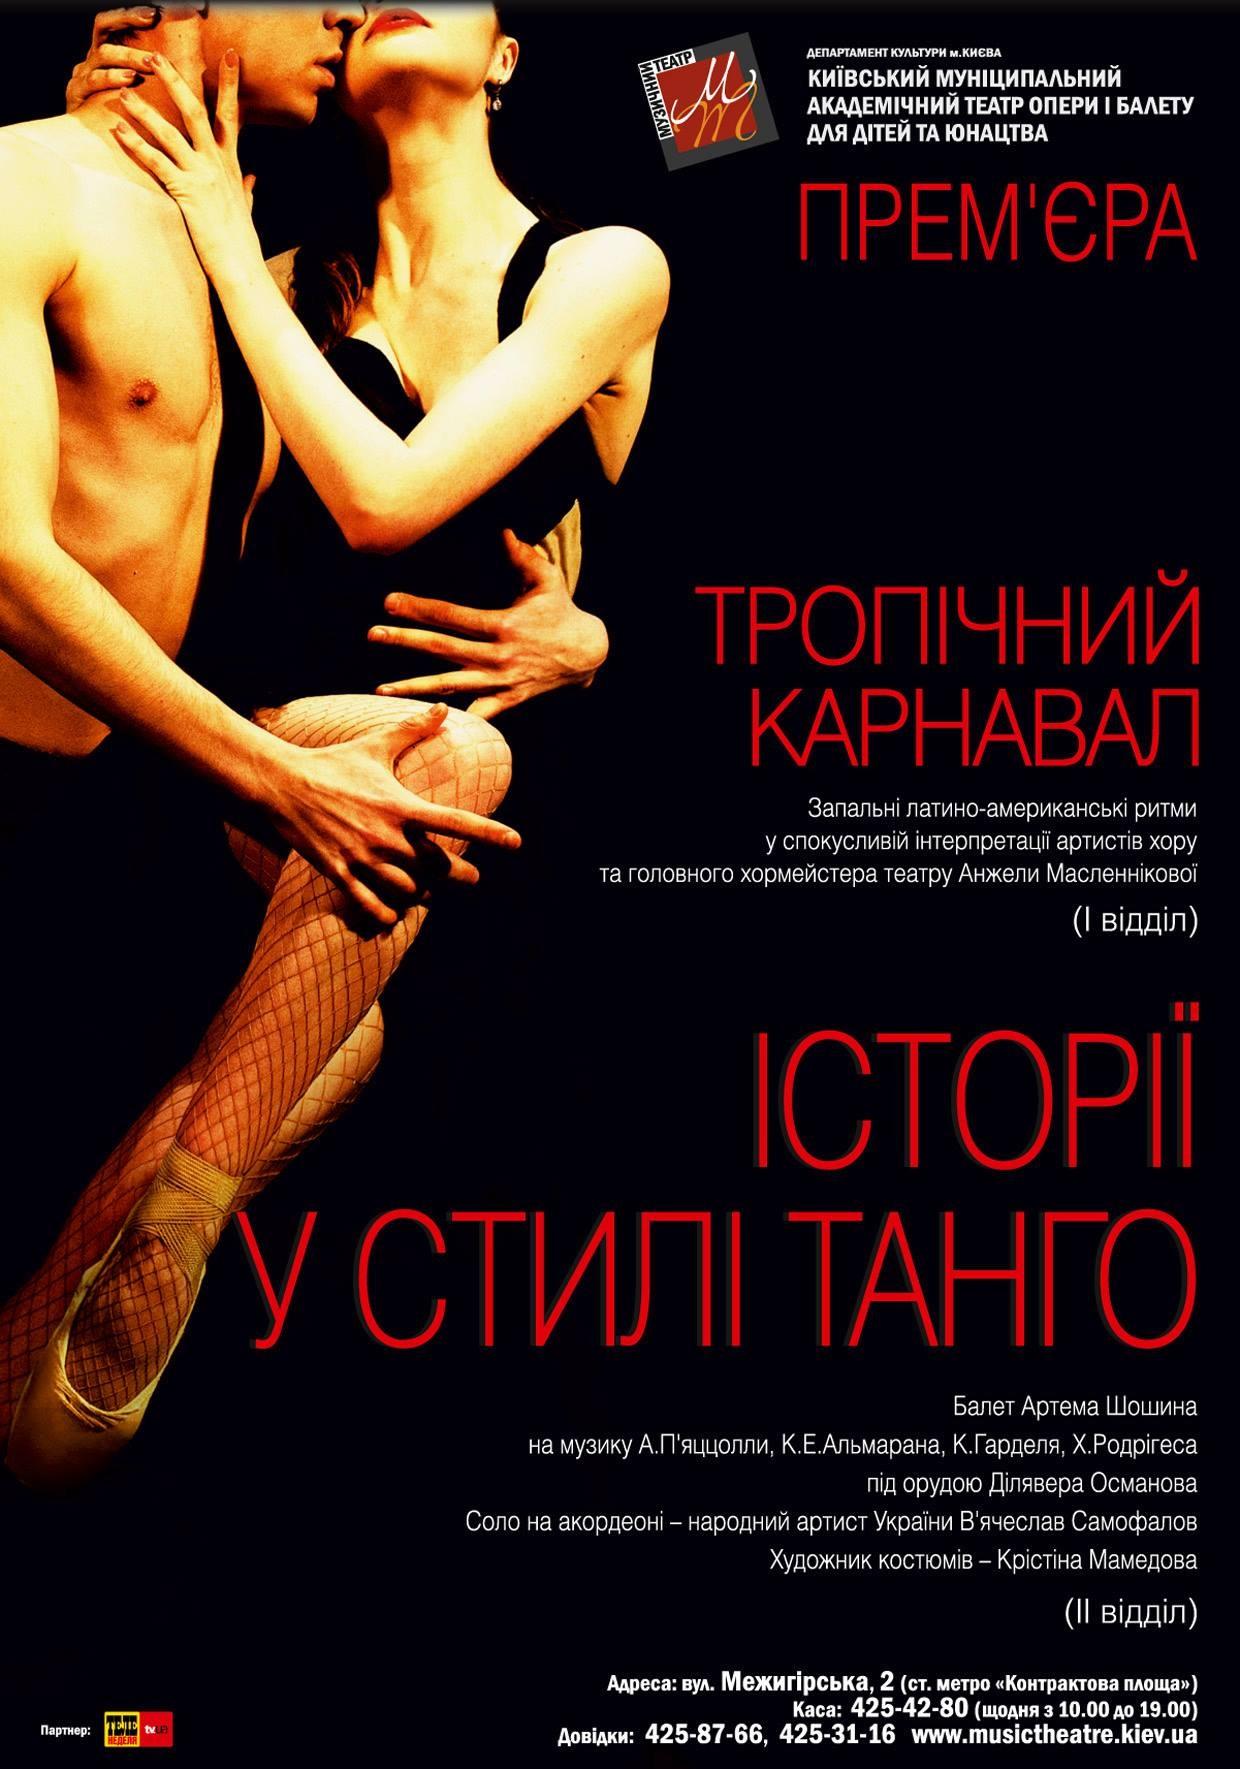 kievskiy-teatr-opery-i-baleta-raspisanie-na-18-22-aprelya-afisha-2